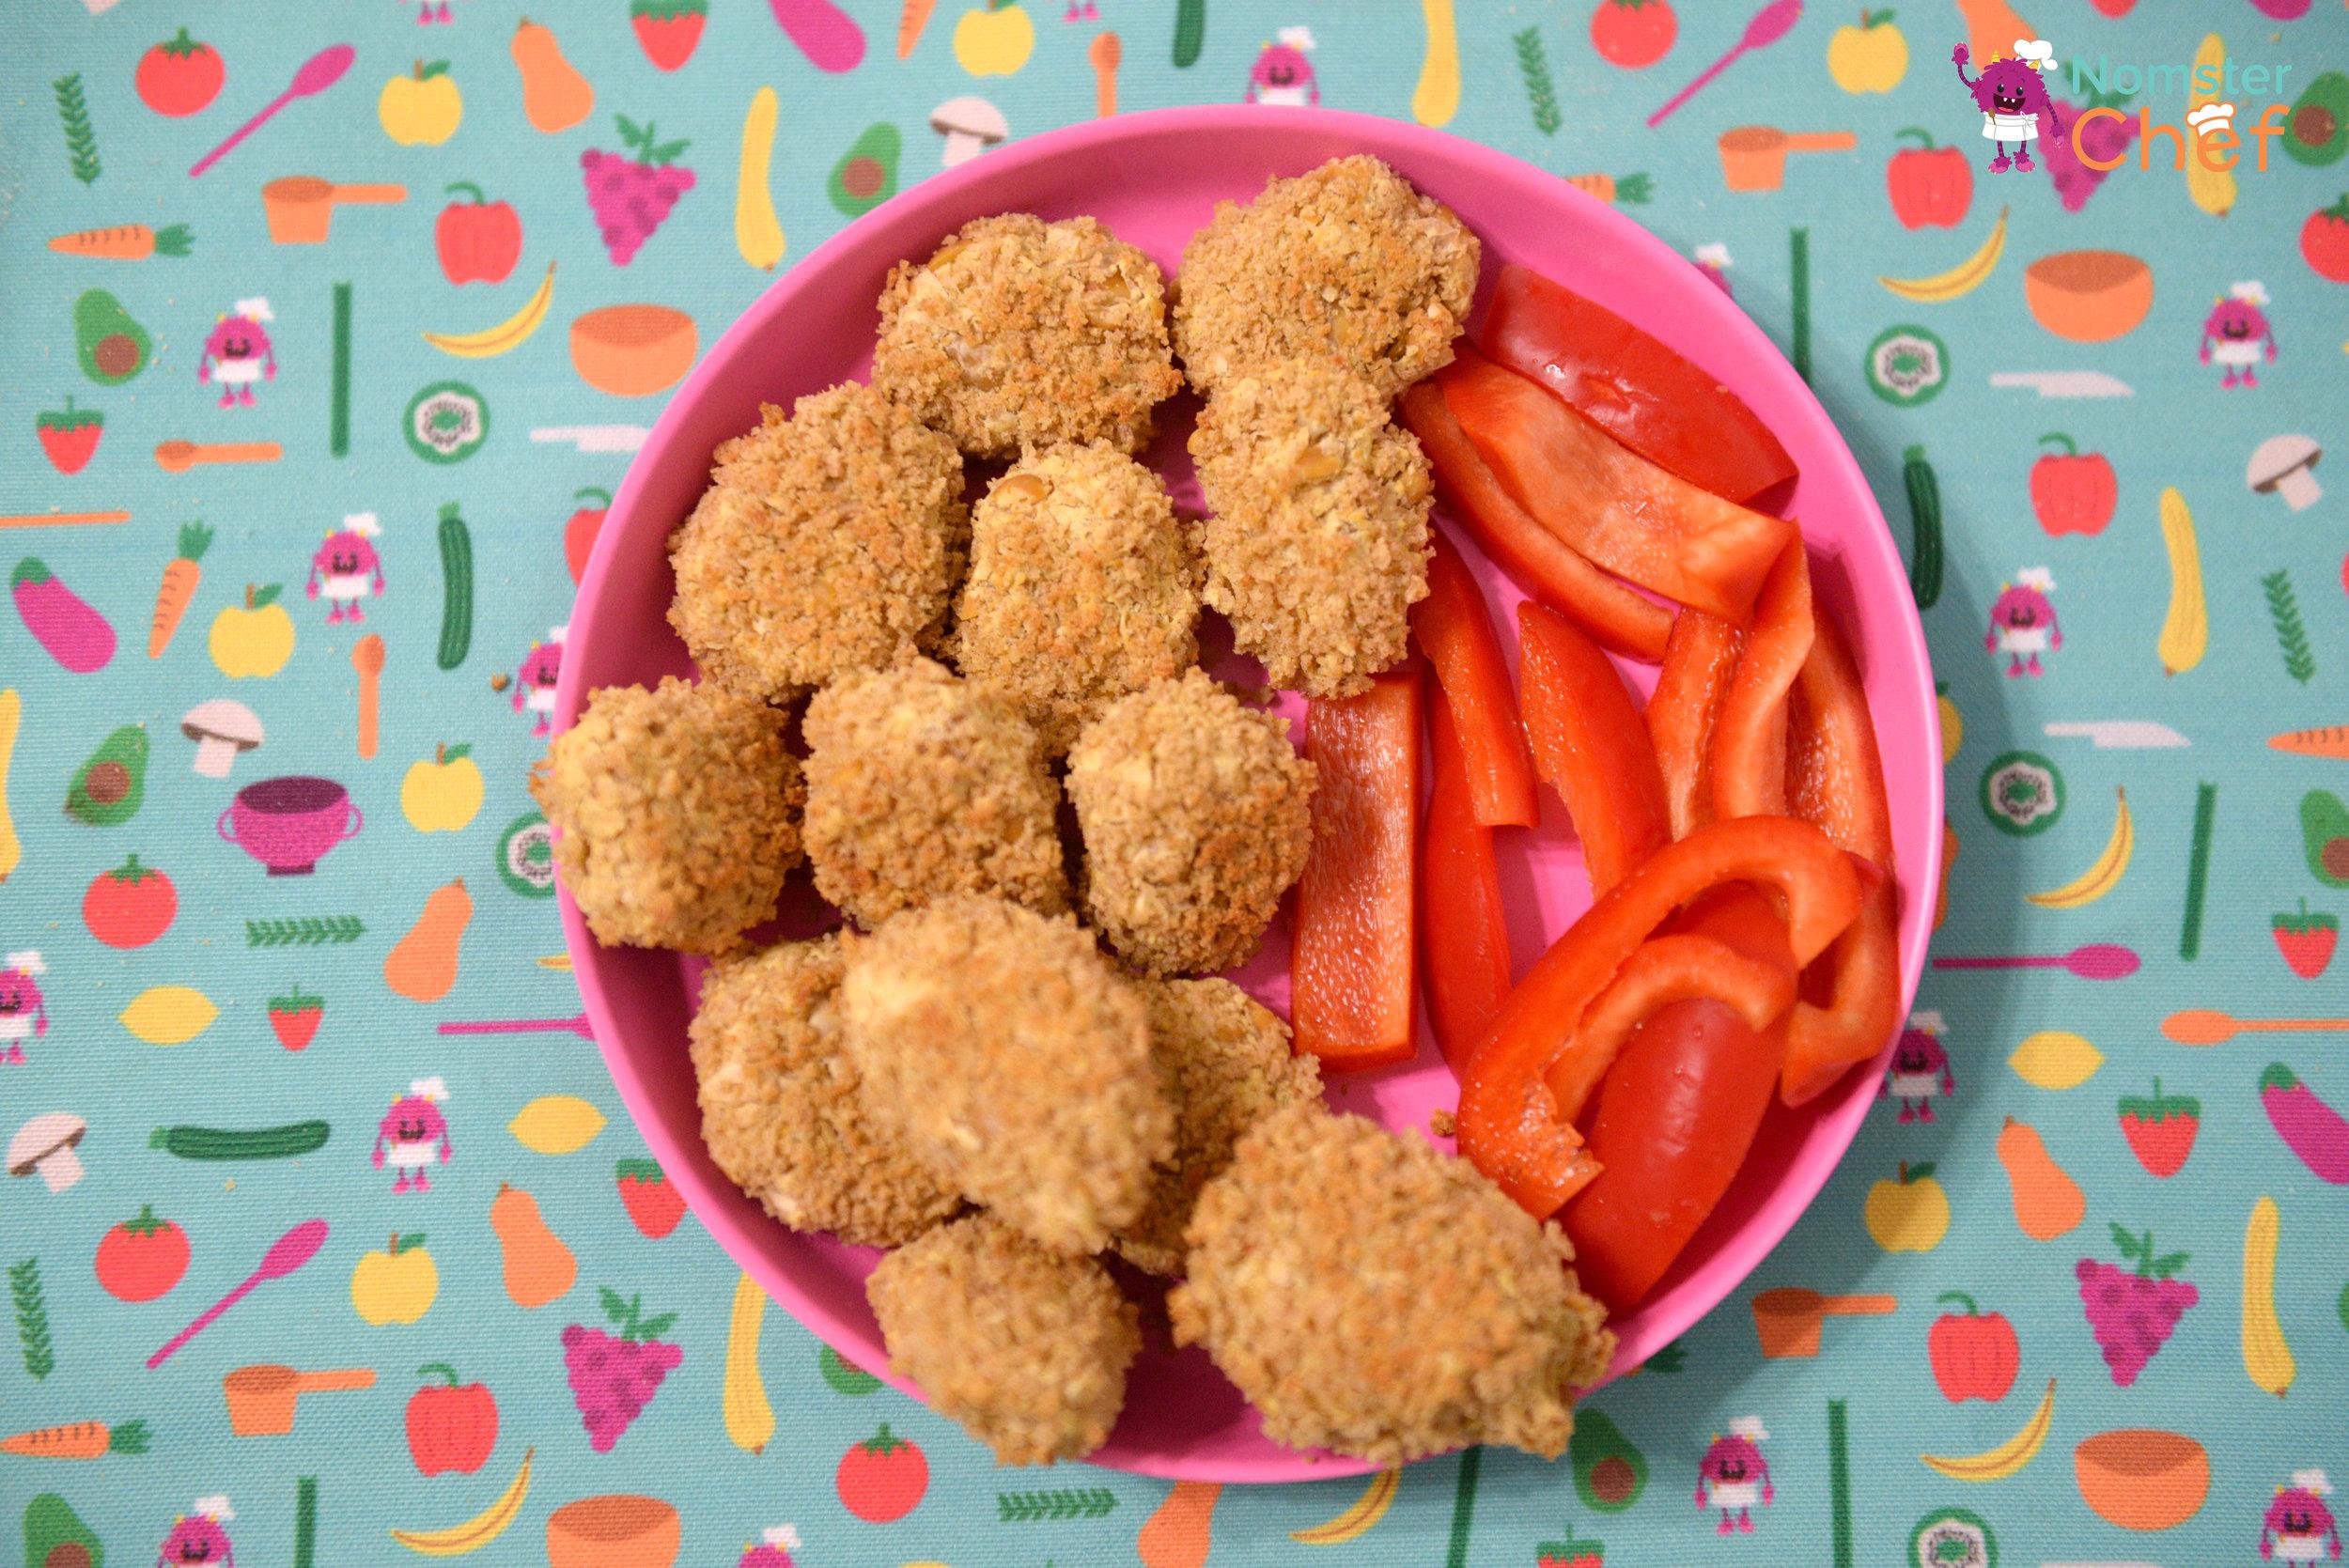 Kitchen_Vocabulary_Chickpea_Nuggets_057 copy.jpg